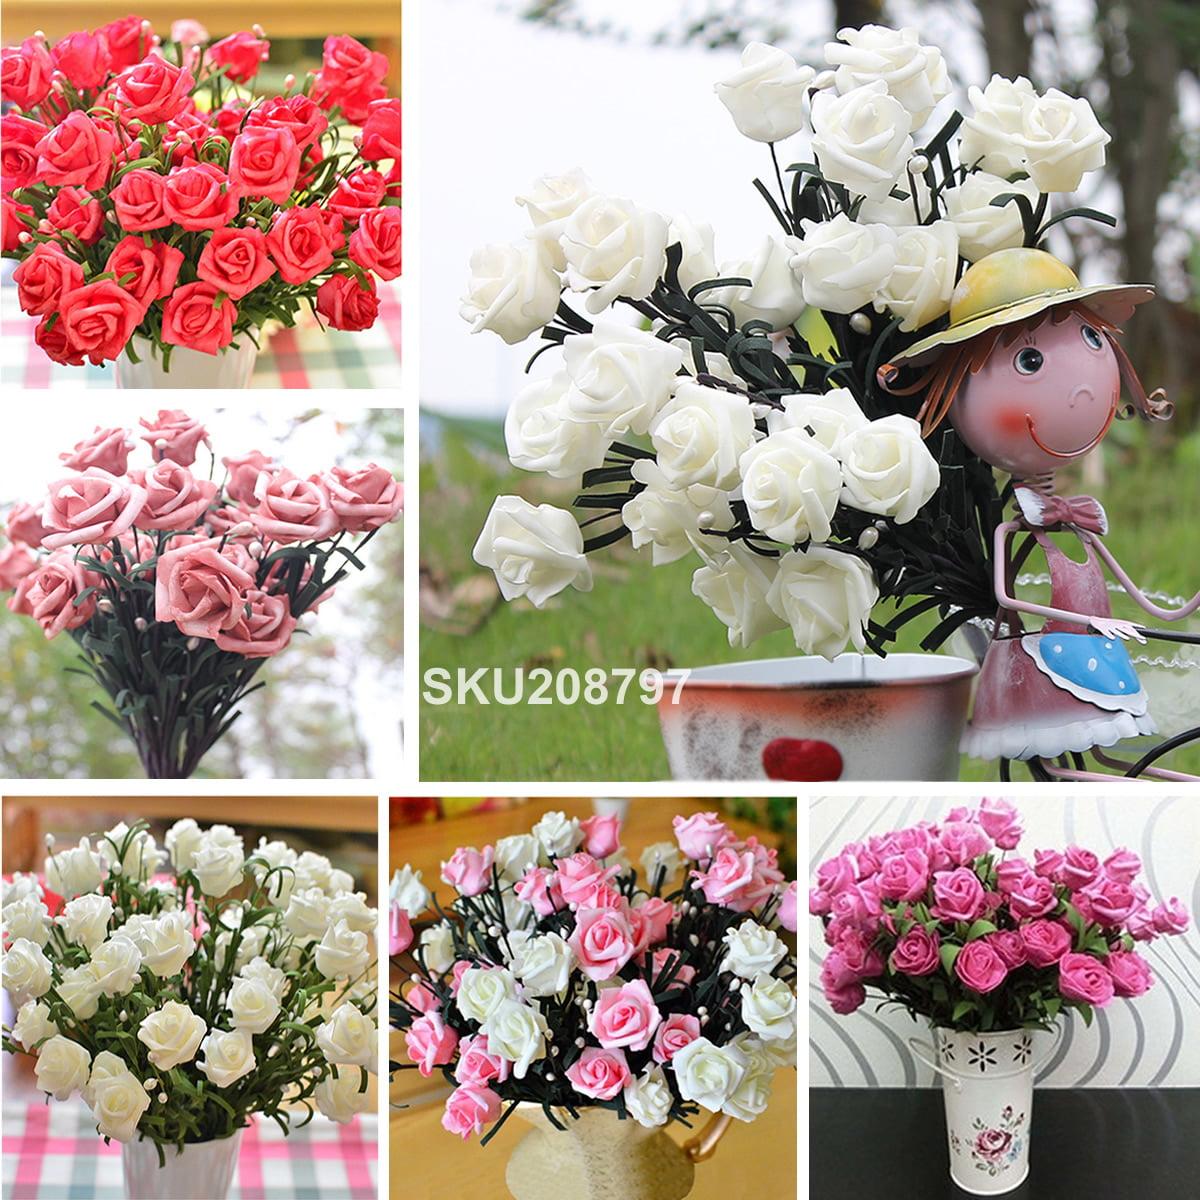 1 Bouquet 6 Heads Flowers Artificial Rose Silk Flower Leaf Home Wedding Decor Bridal